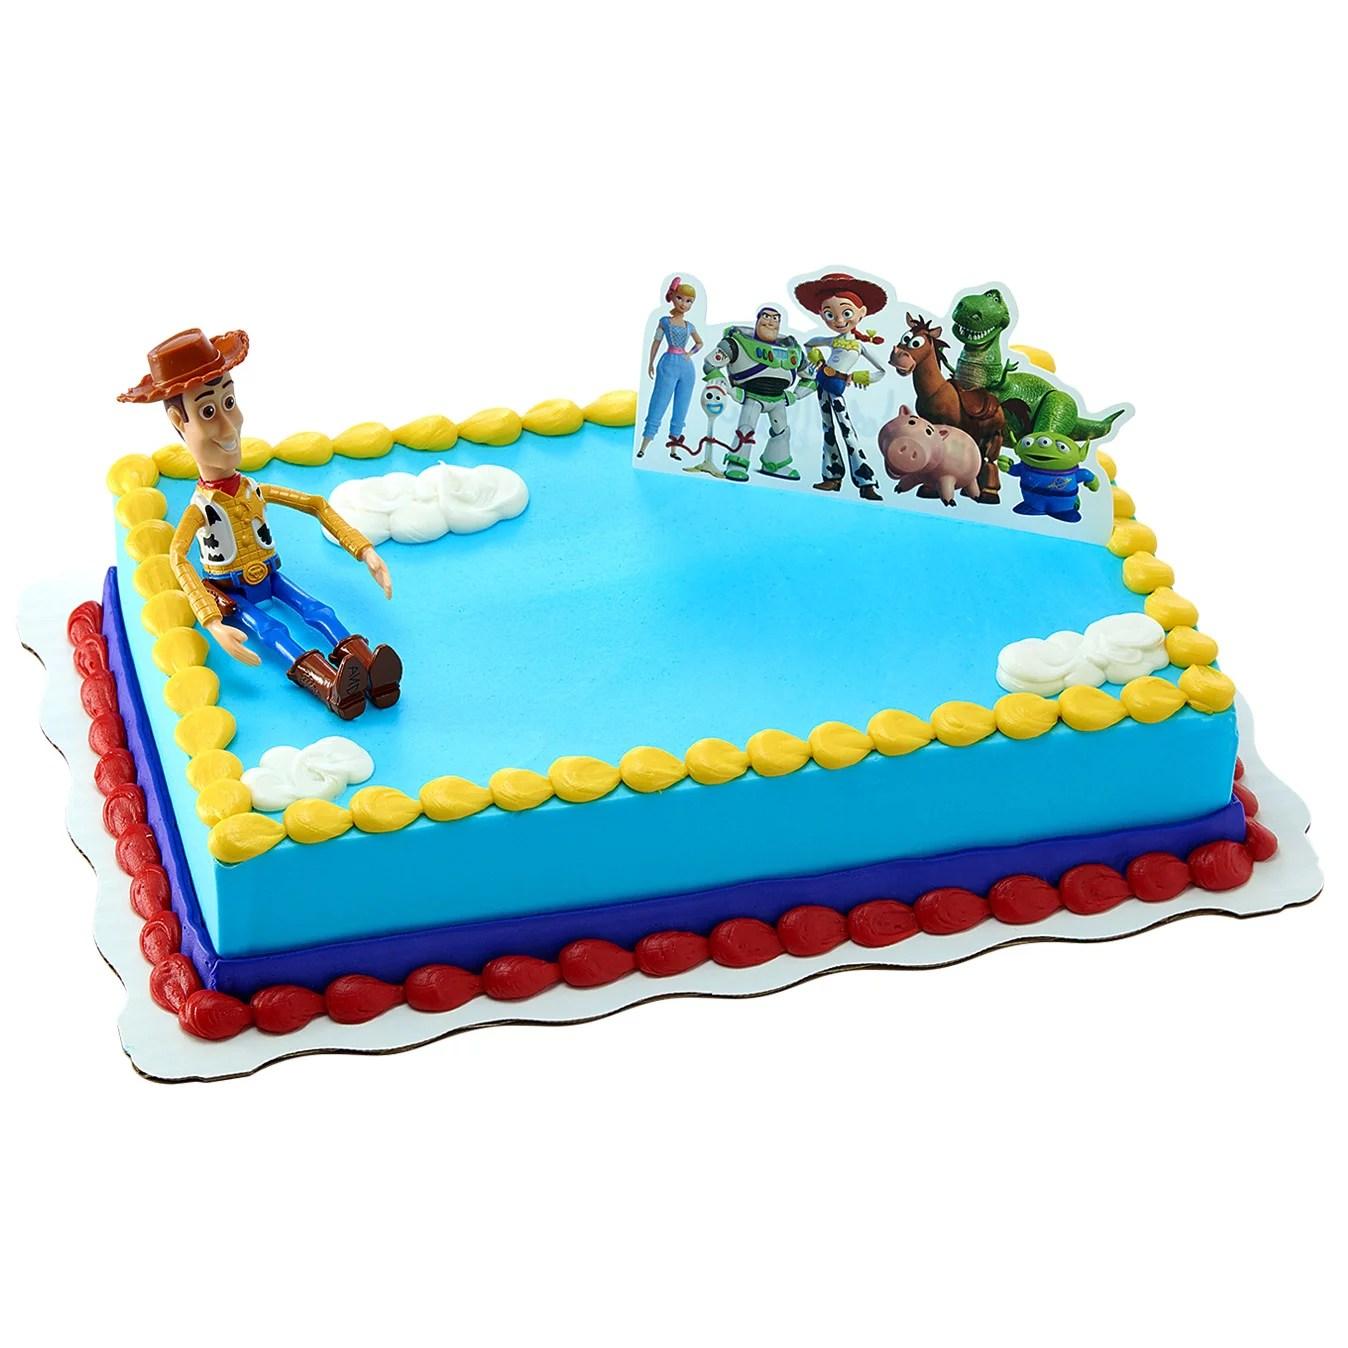 Toy Story 4 Kit Sheet Cake Walmart Com Walmart Com